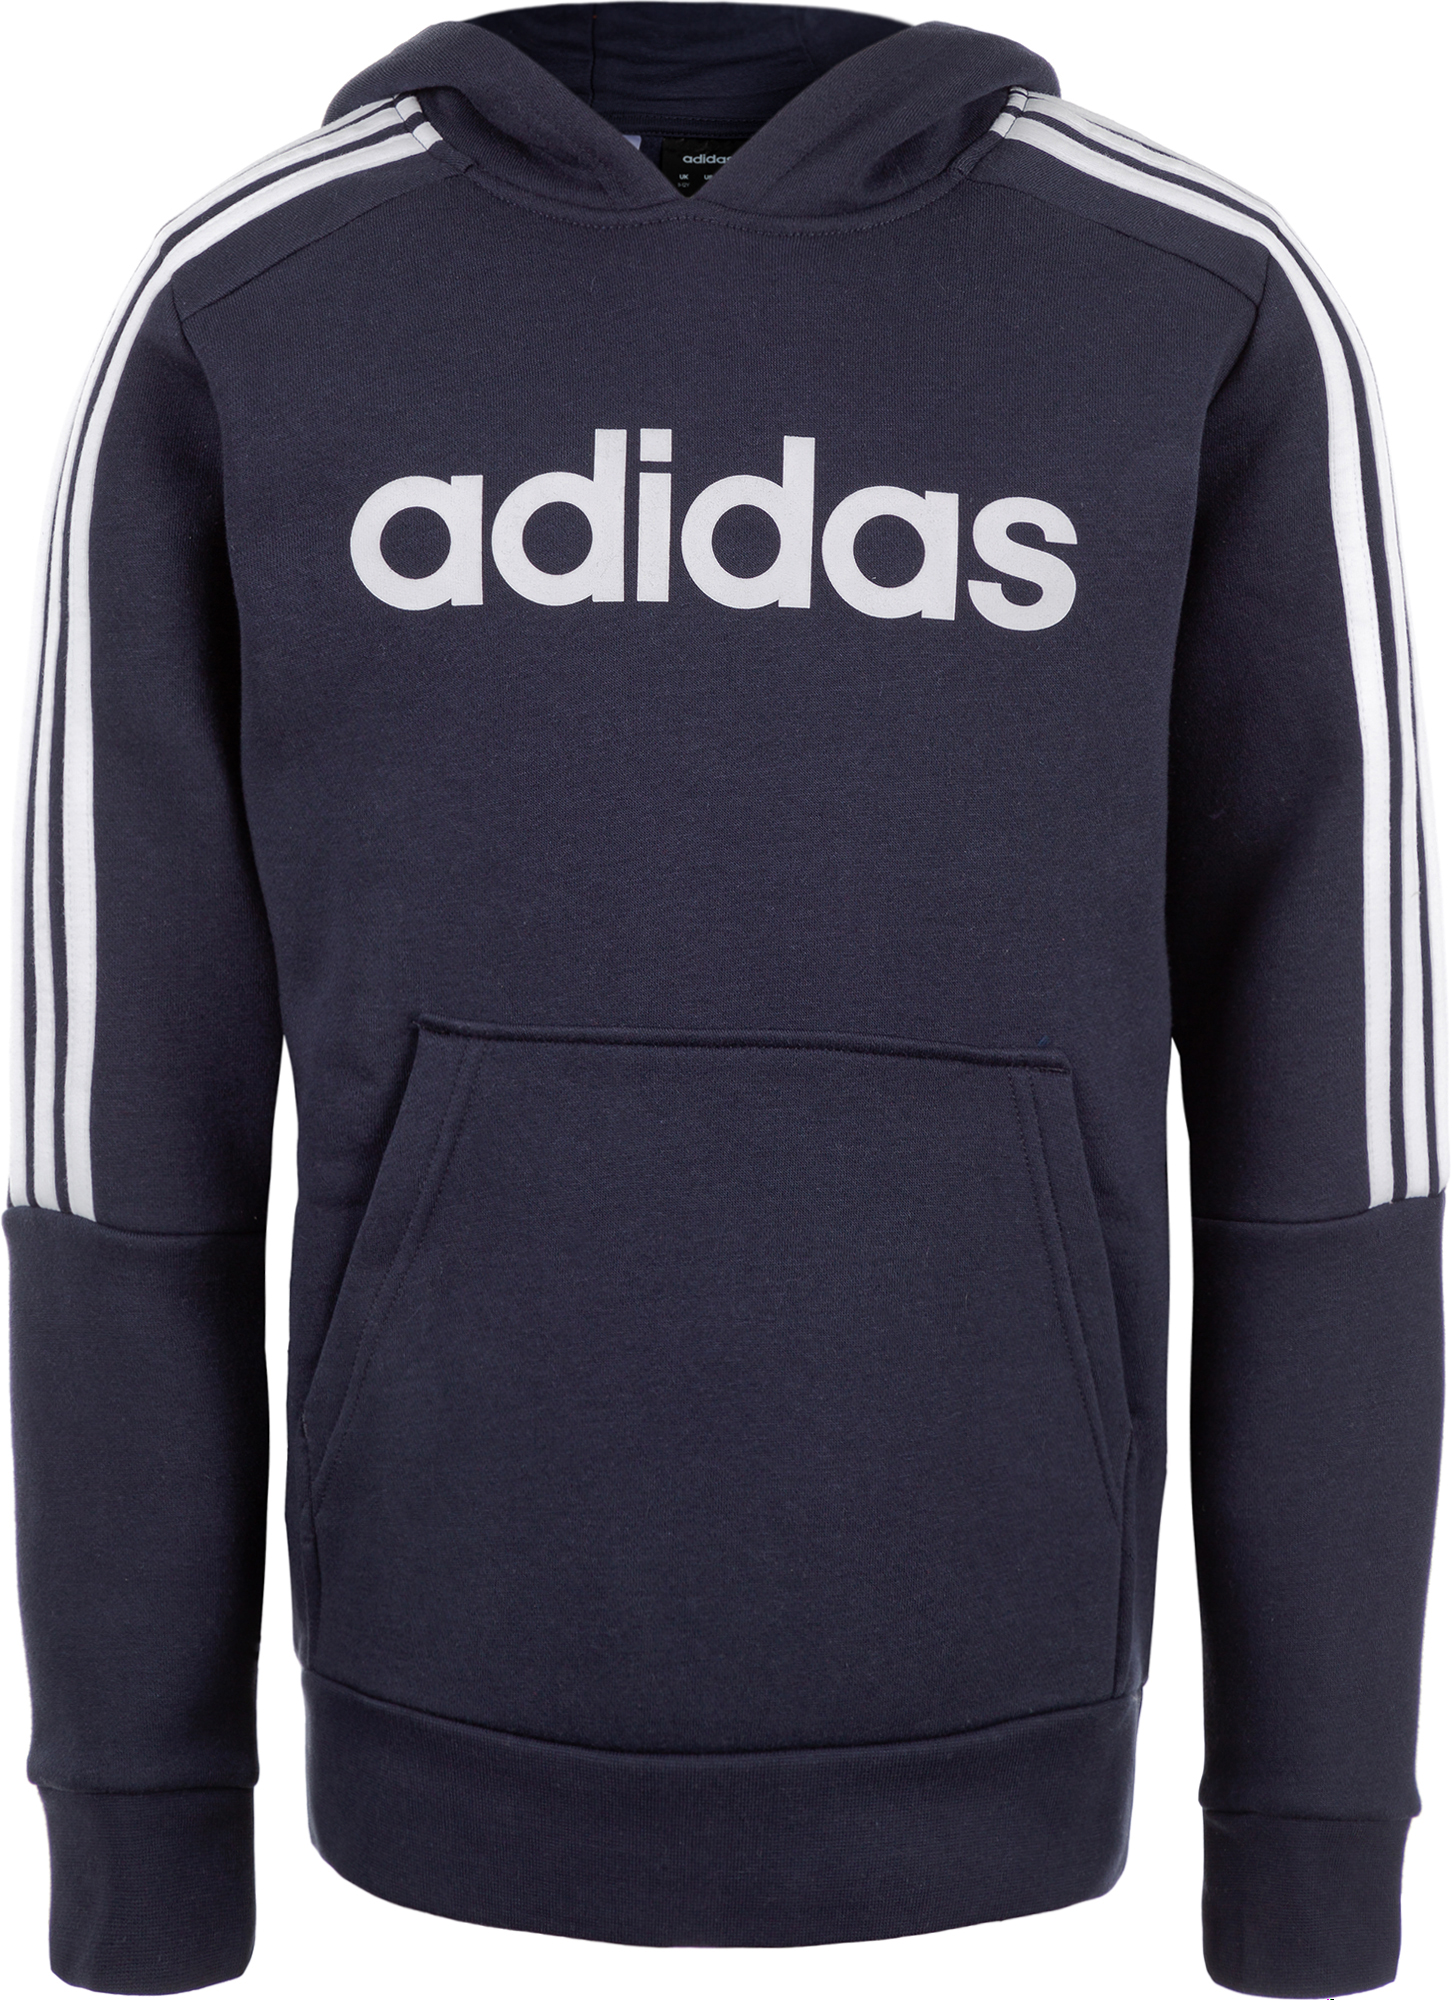 Adidas Худи для мальчиков 3-Stripes, размер 170